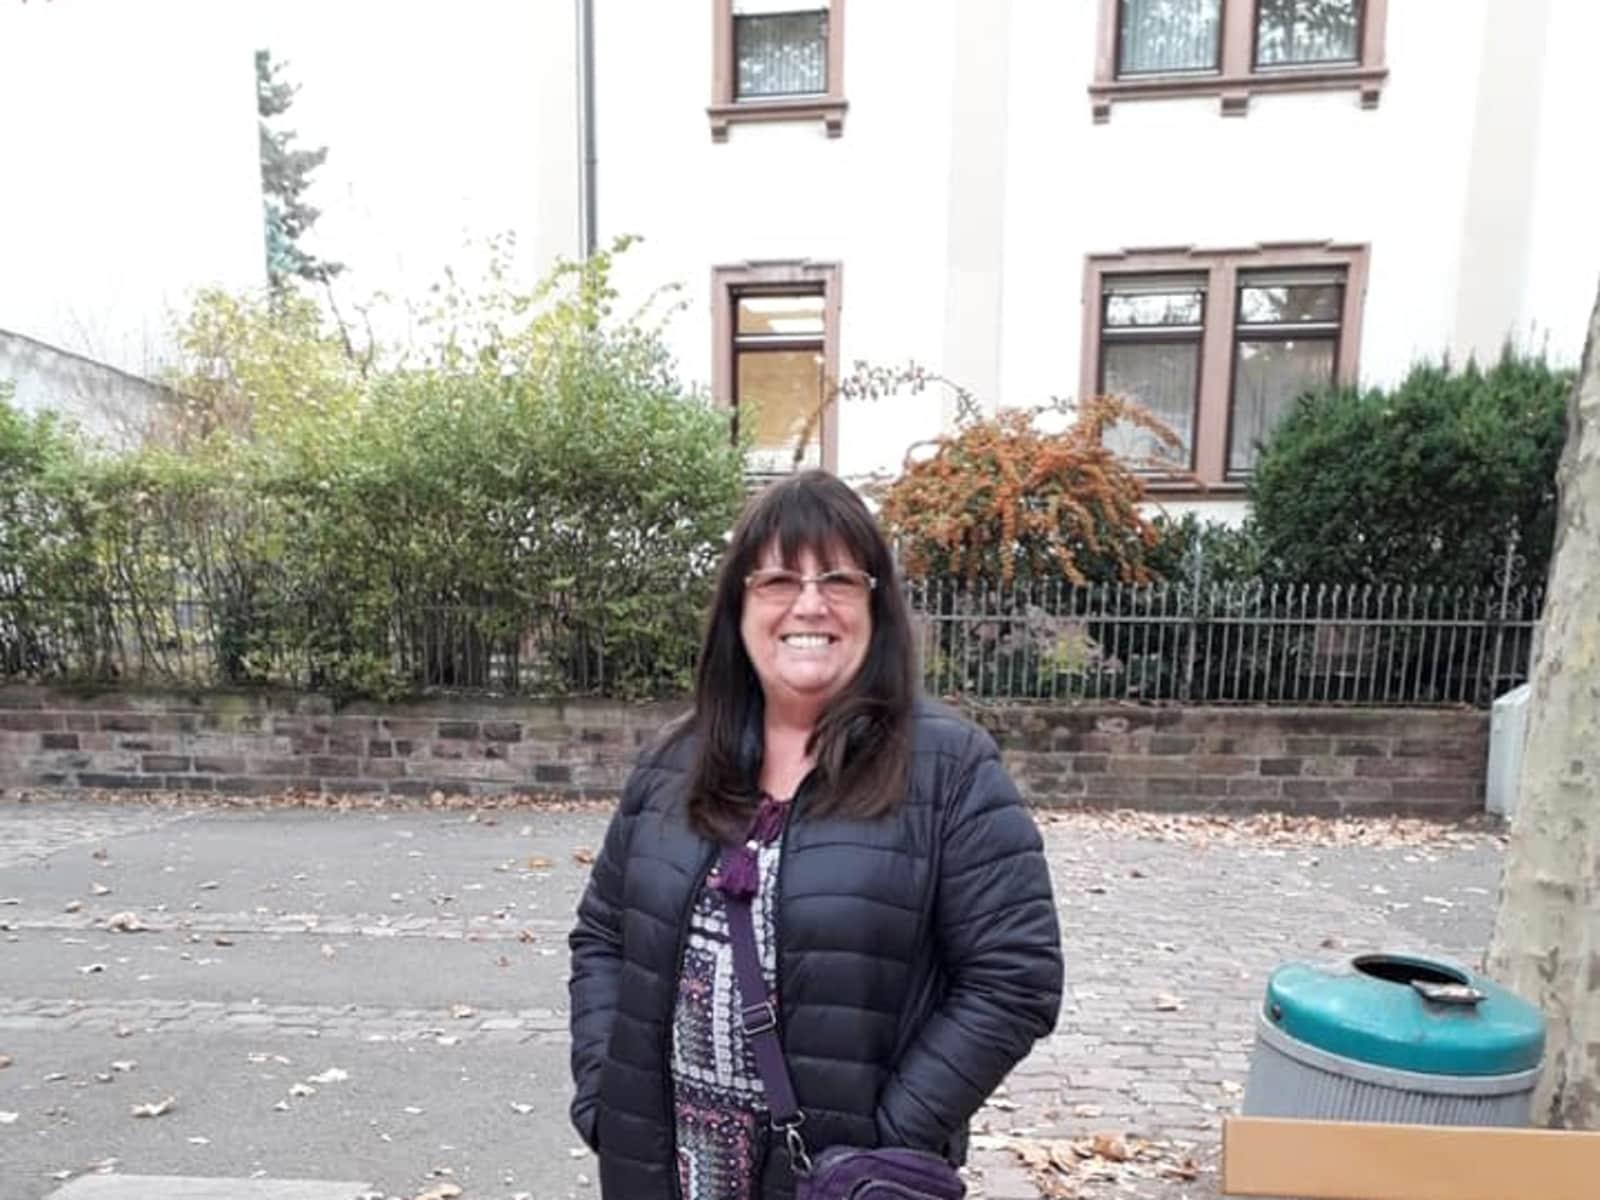 Diane from Mannheim, Germany